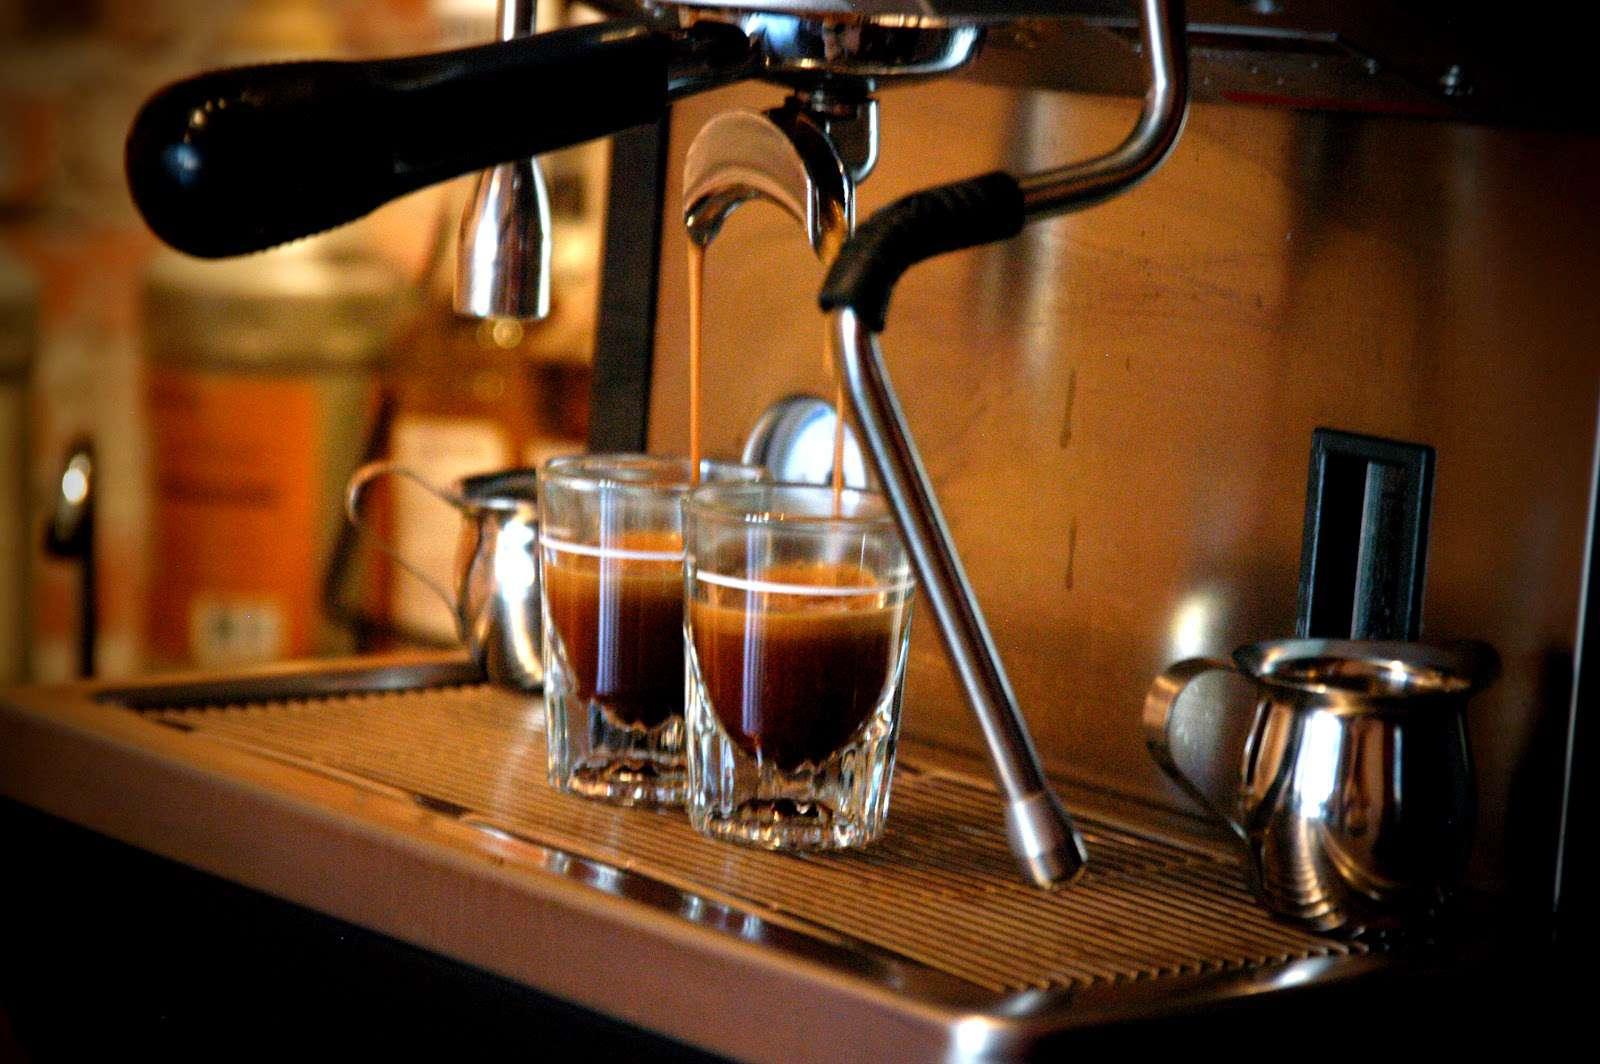 Pha Cafe bằng máy